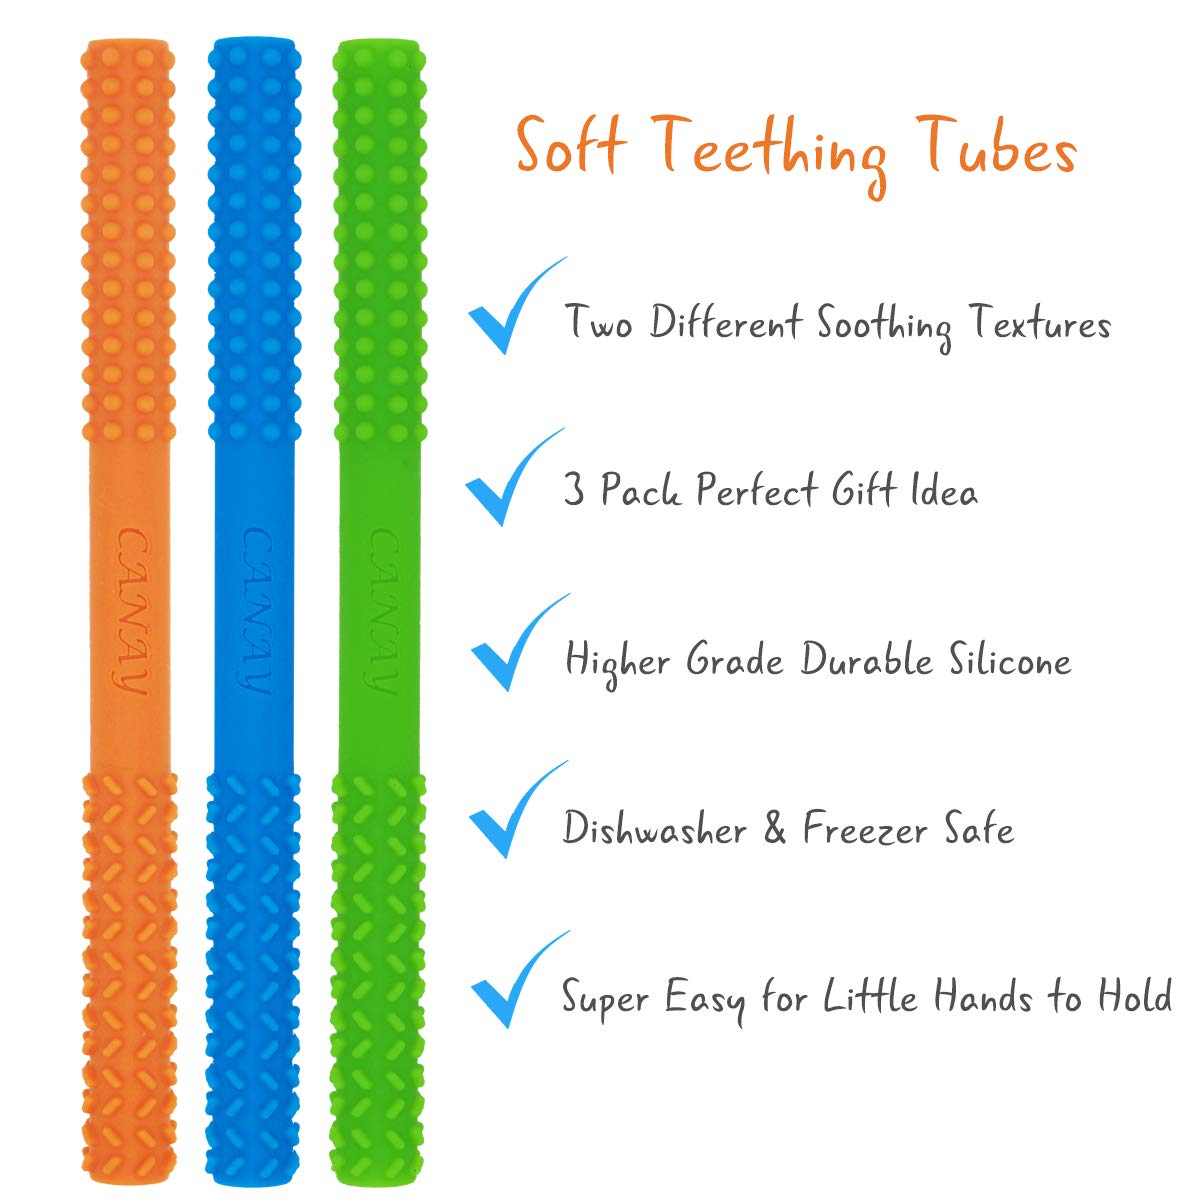 Teething Toys for Babies 0+ Months BPA Free//Freezer Safe//Dishwasher Safe Y Baby Teethers Hollow Teething Tubes